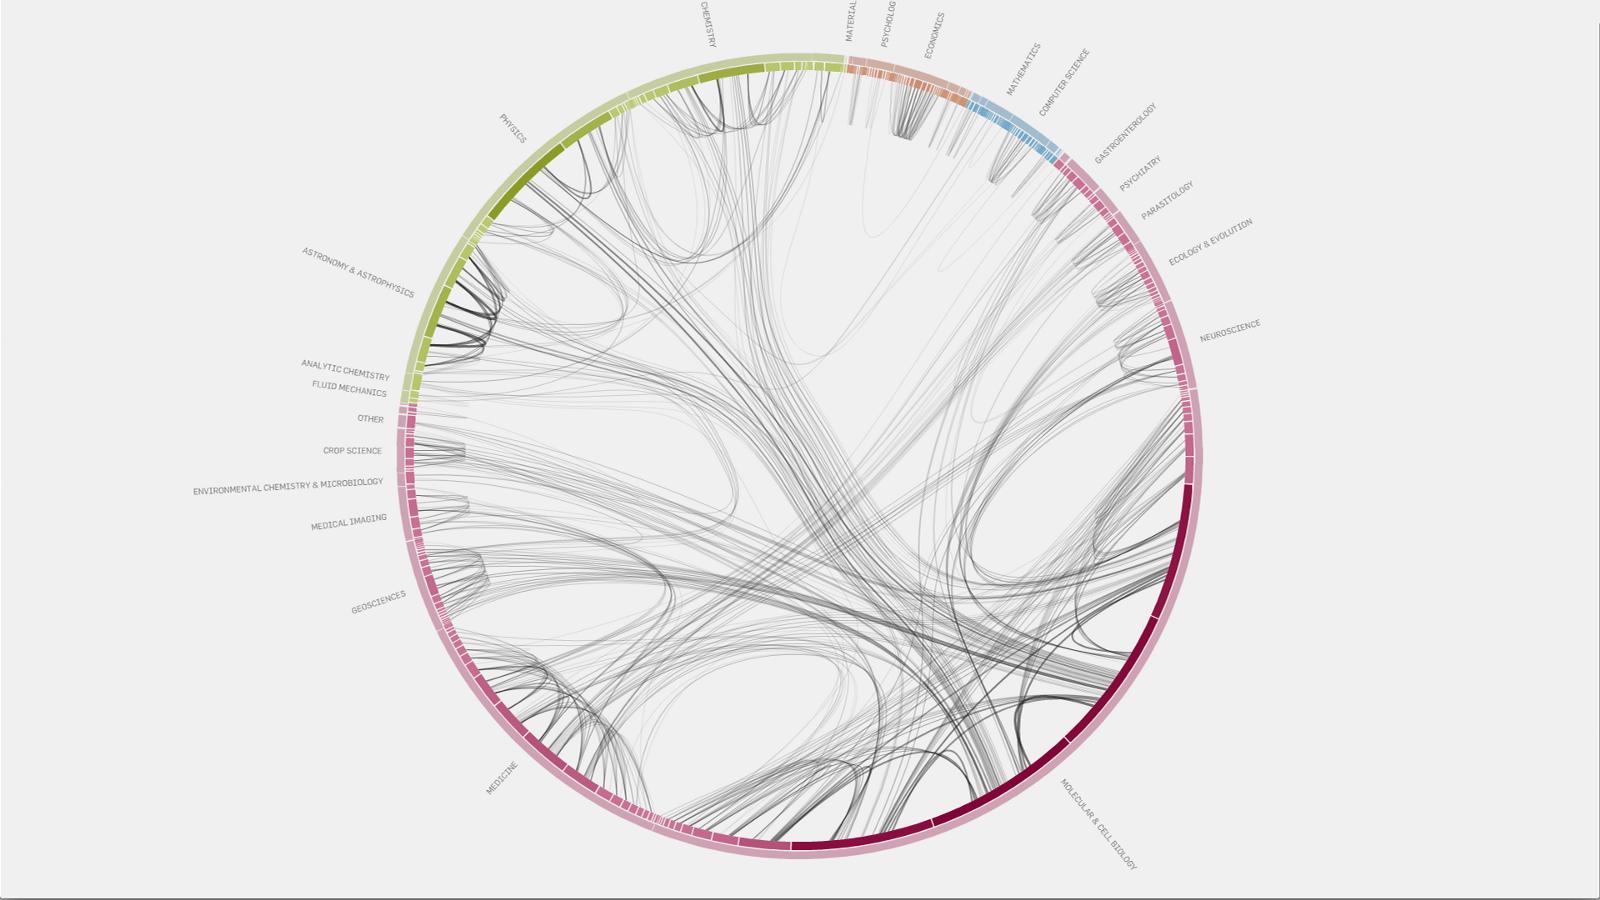 sankey diagram editor